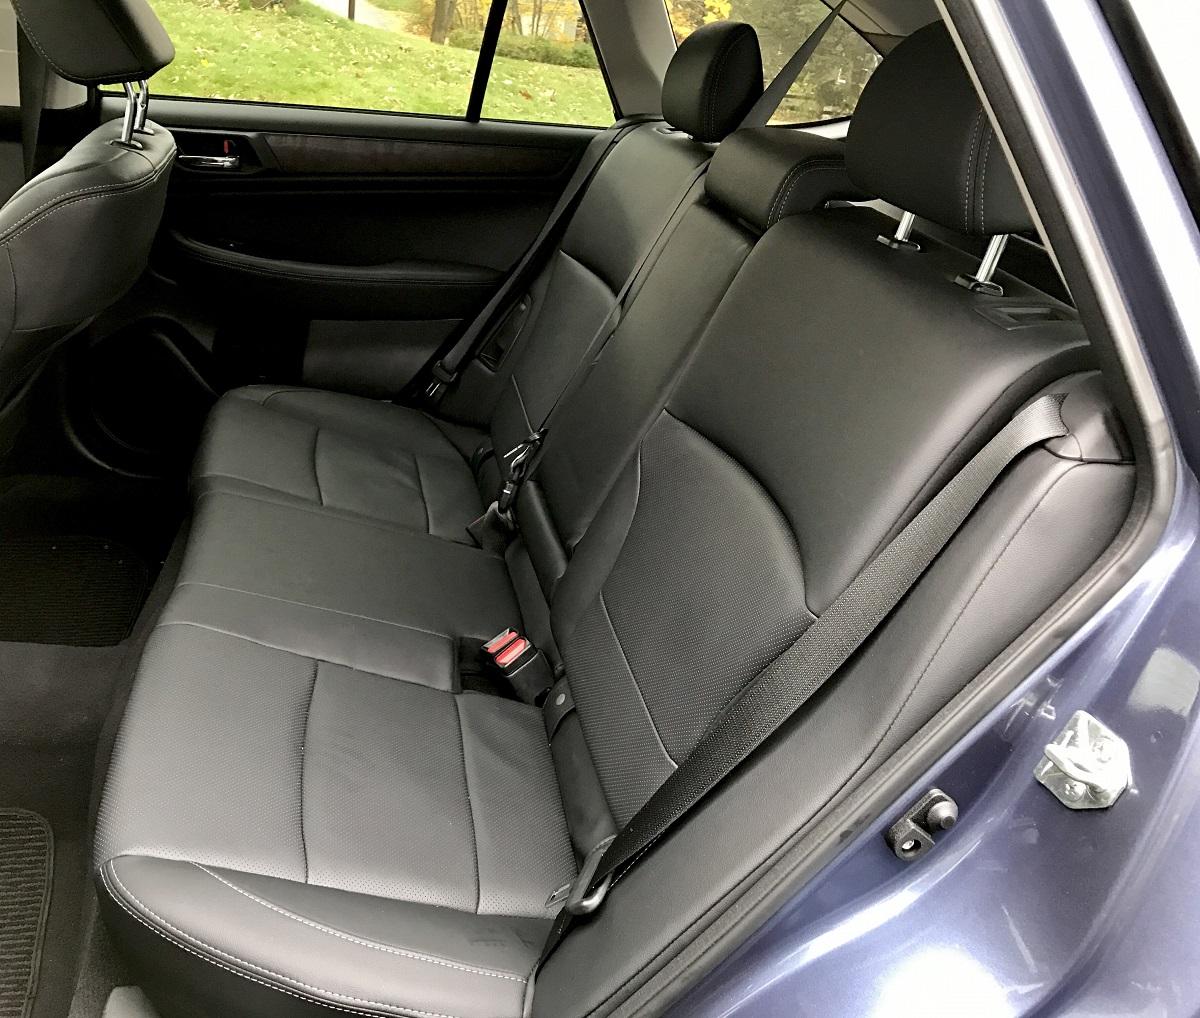 2017-subaru-outback-rear-seats